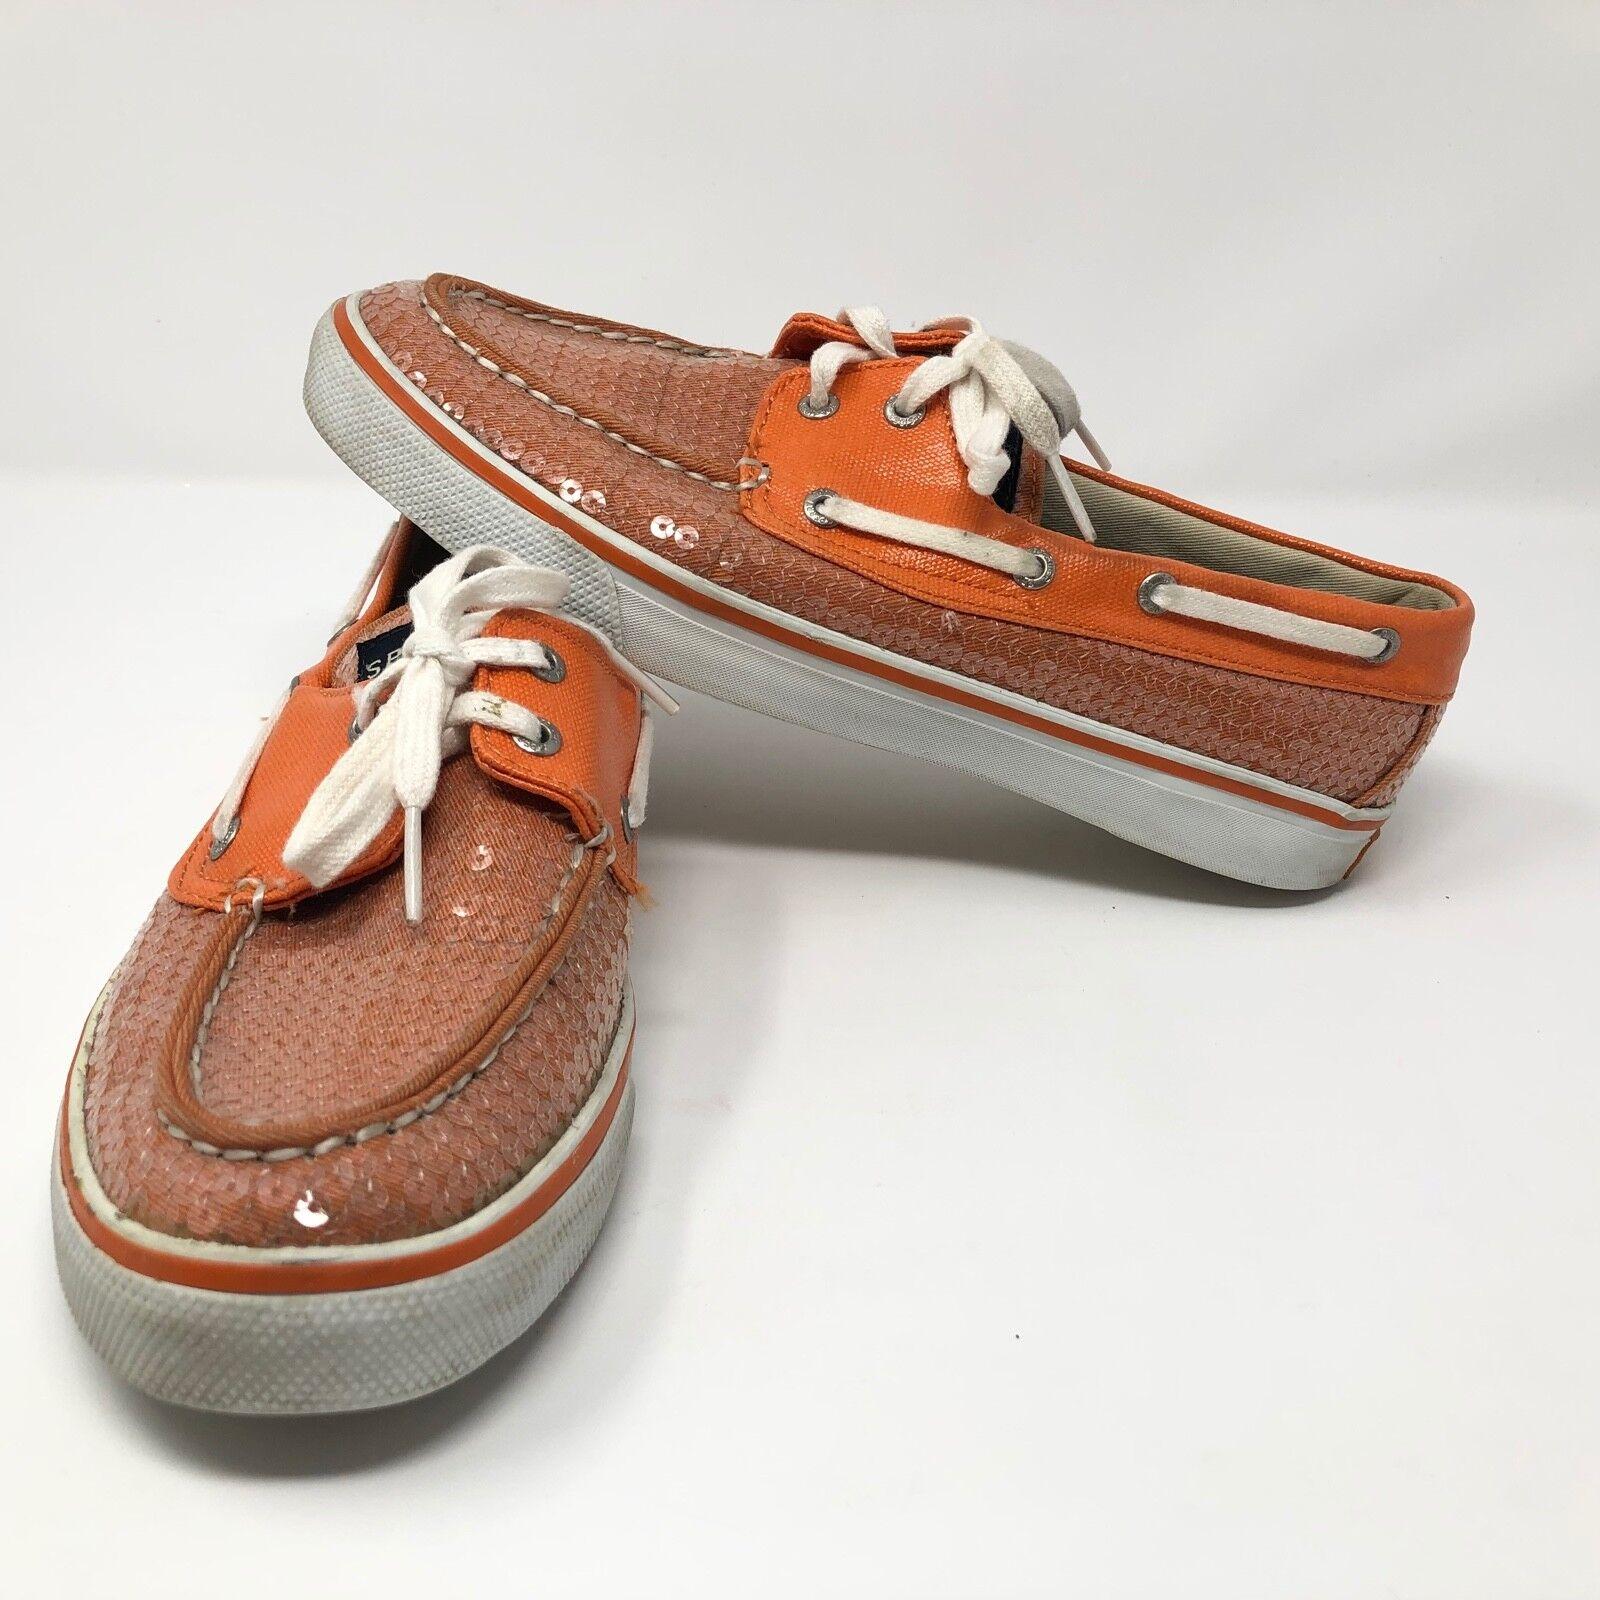 Sperry Top Sider Womens Bahama orange Sparkle Slip On Boat shoes Sz 8